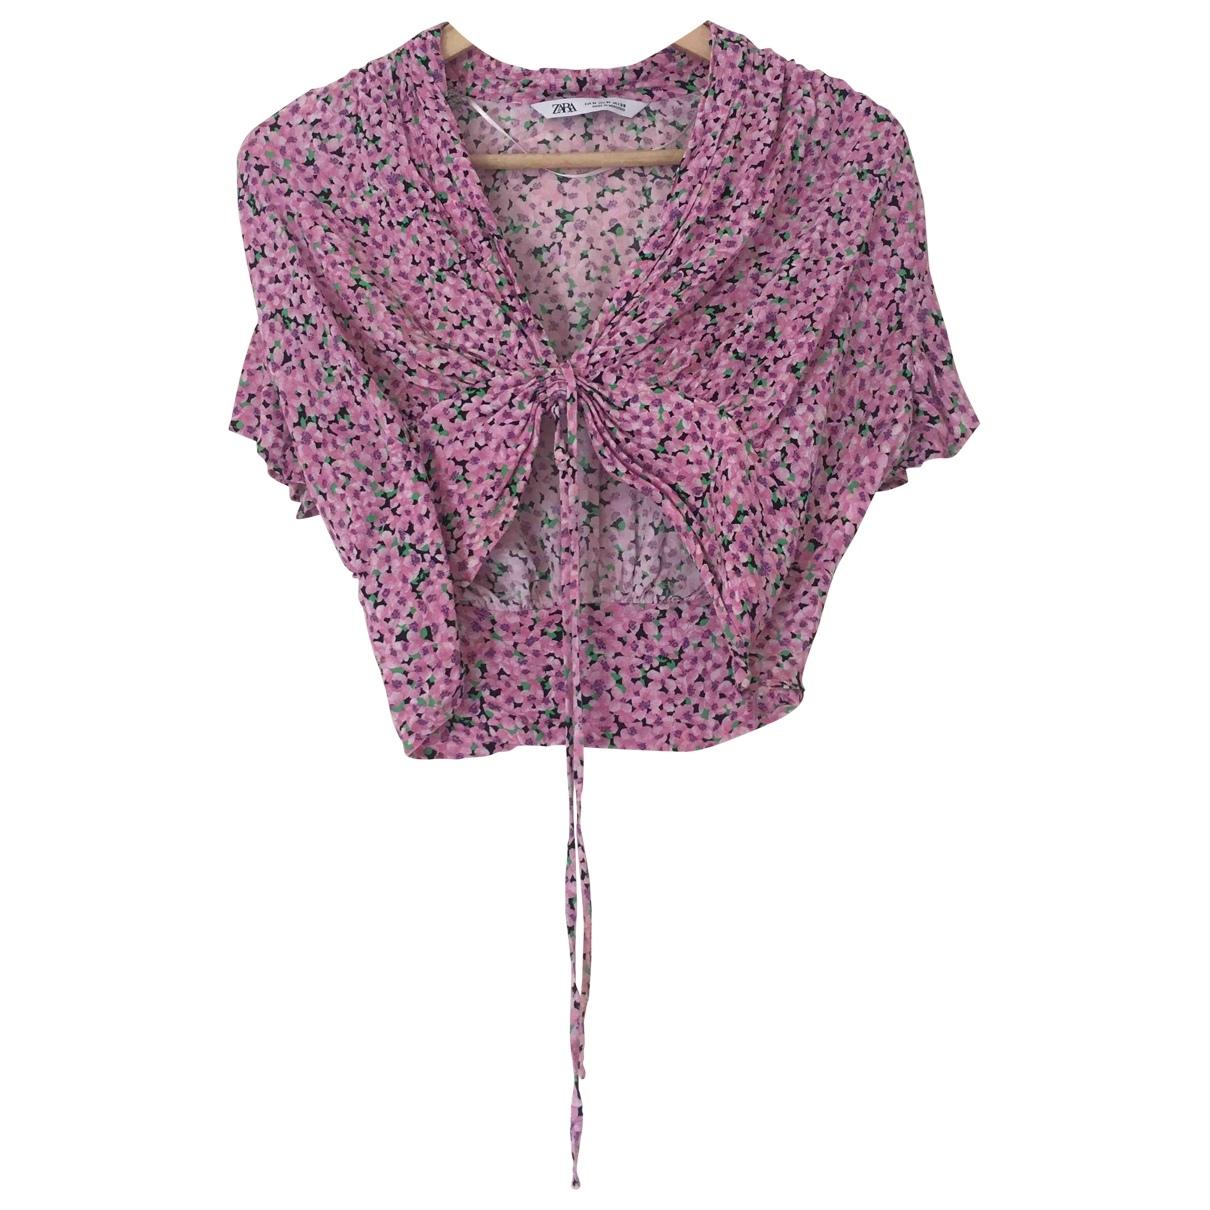 Zara \N Multicolour  top for Women M International